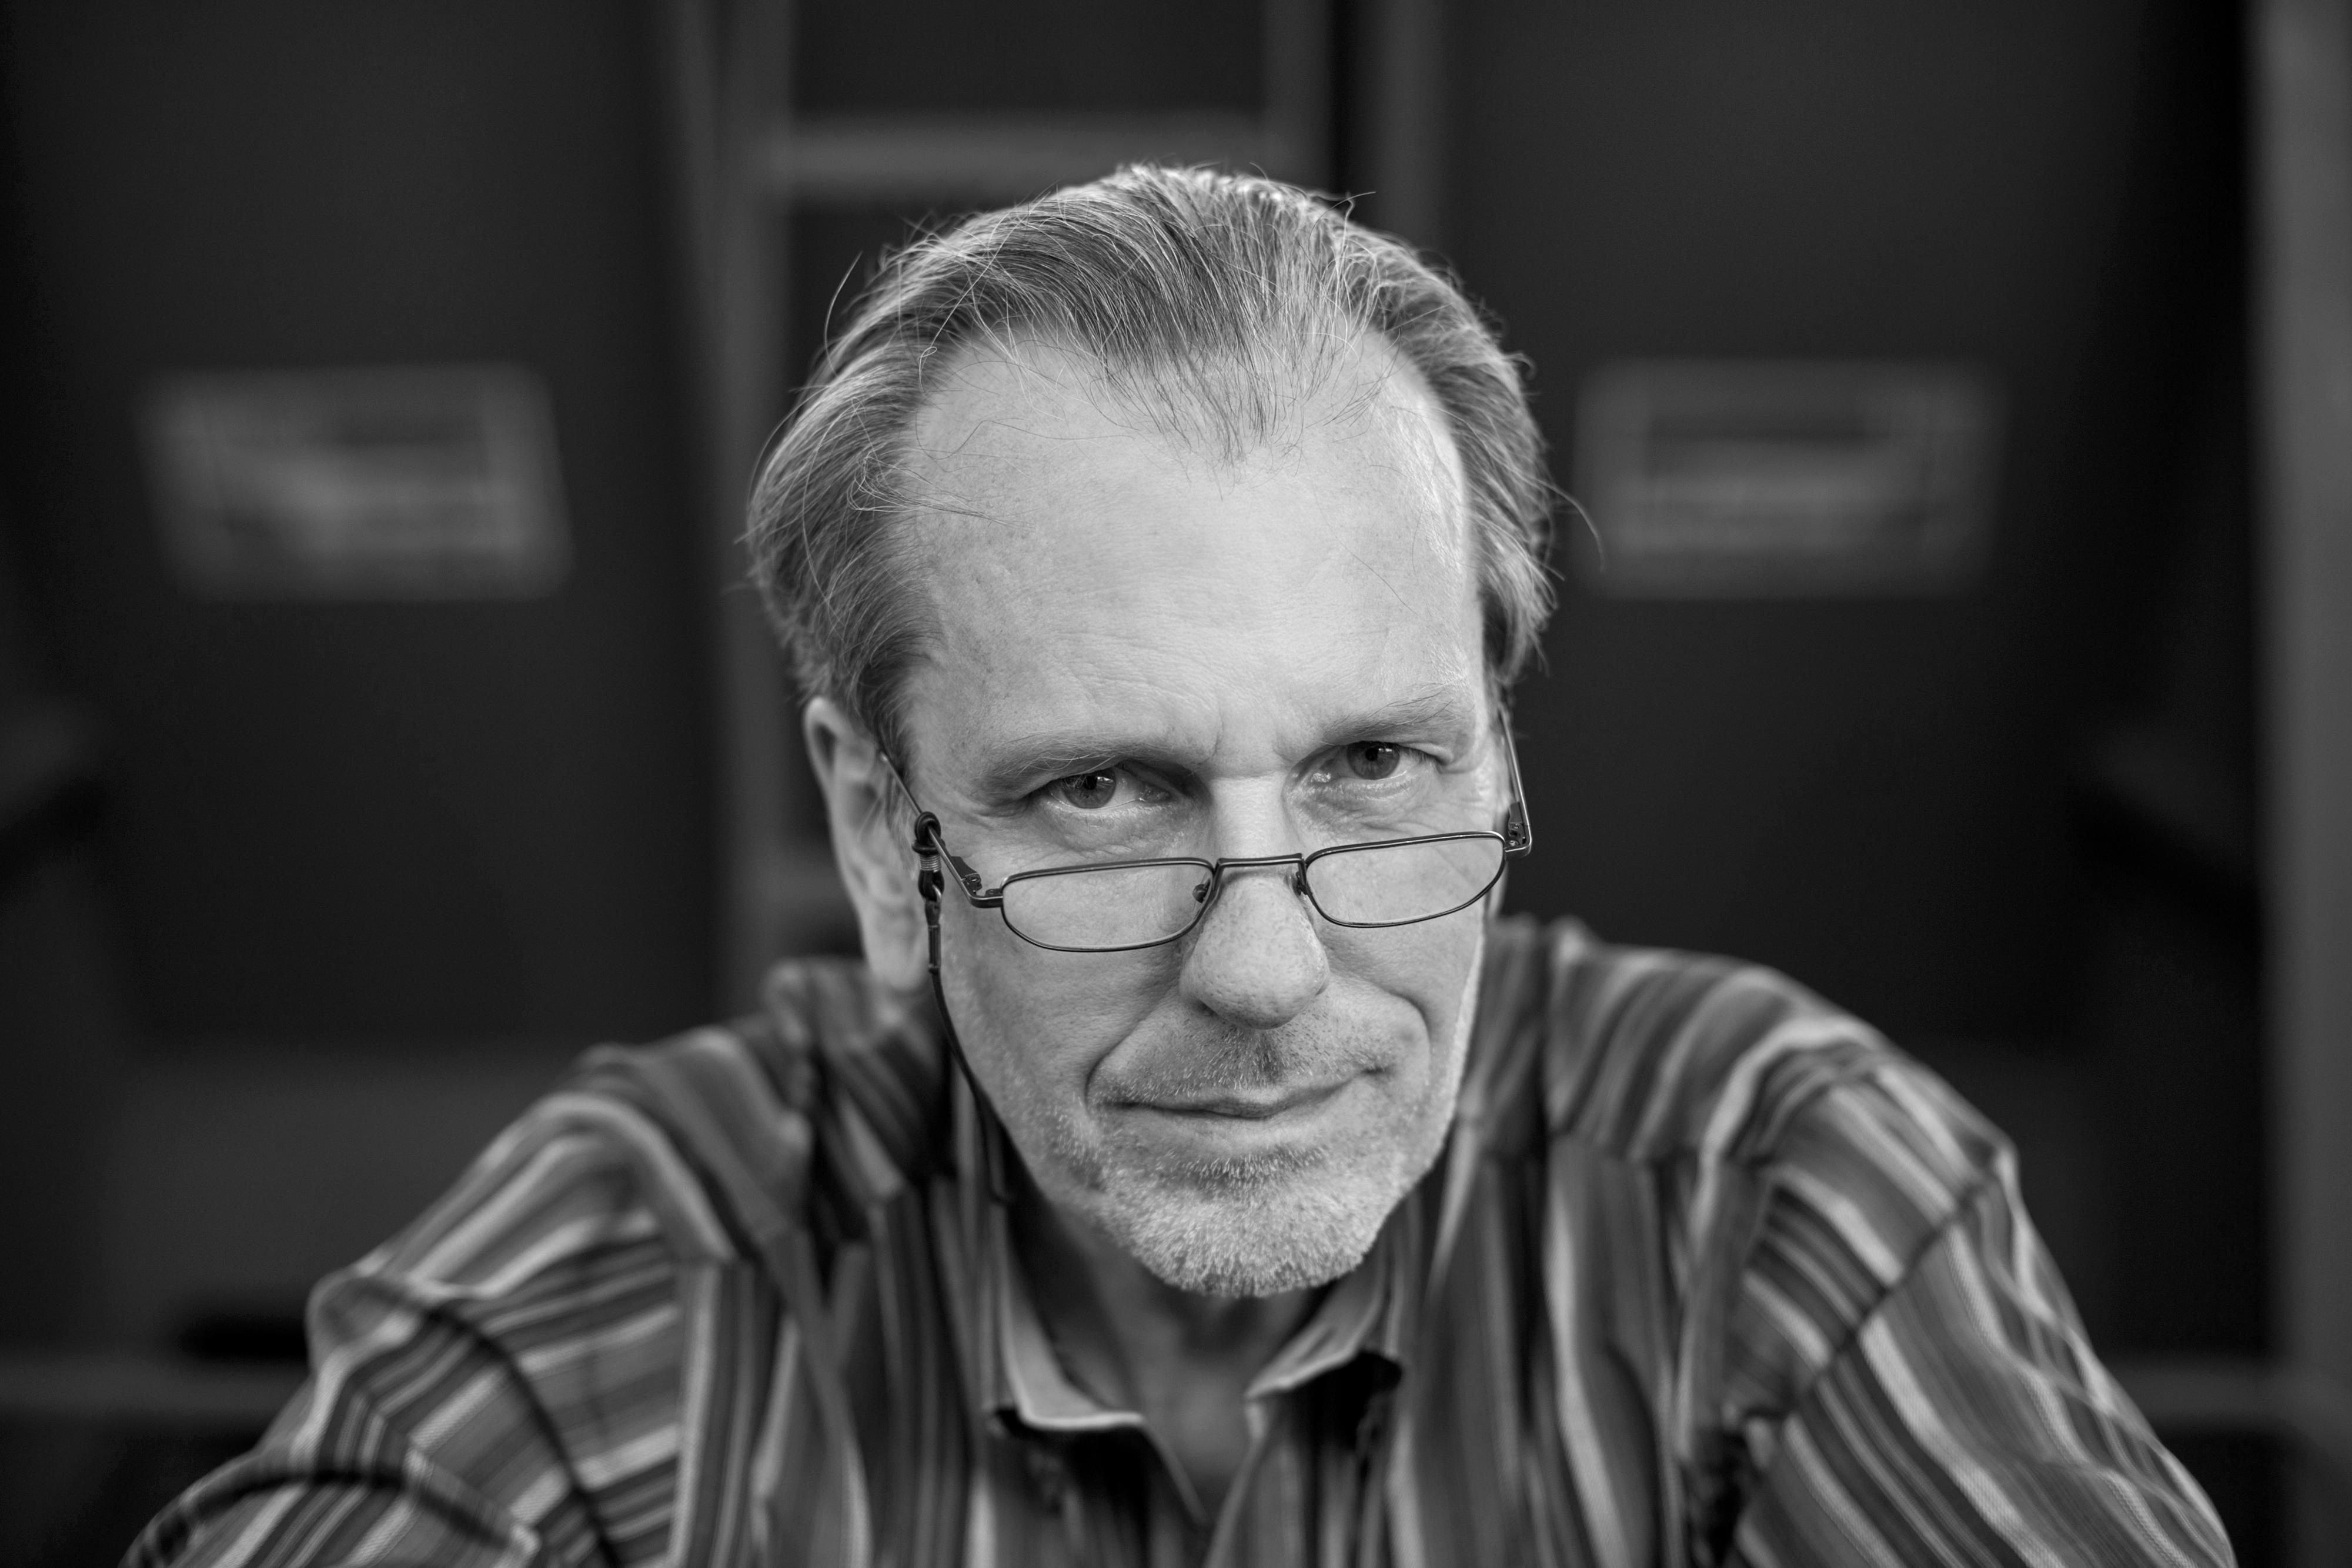 michael marwitz